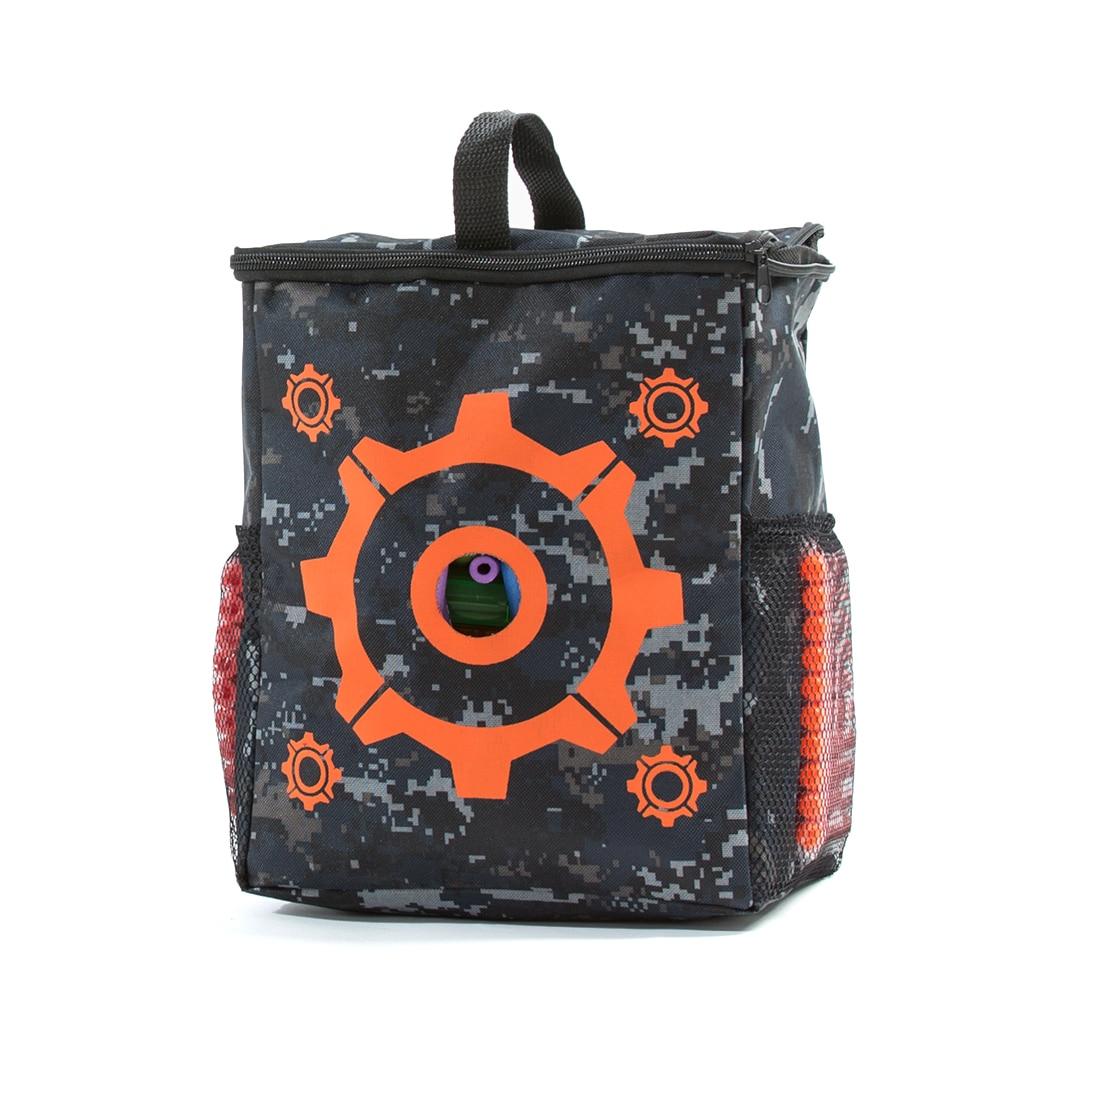 Oxford Cloth Target Pattern Shooting Practice Bag Soft Bullet Bag for Nerf - Camouflage